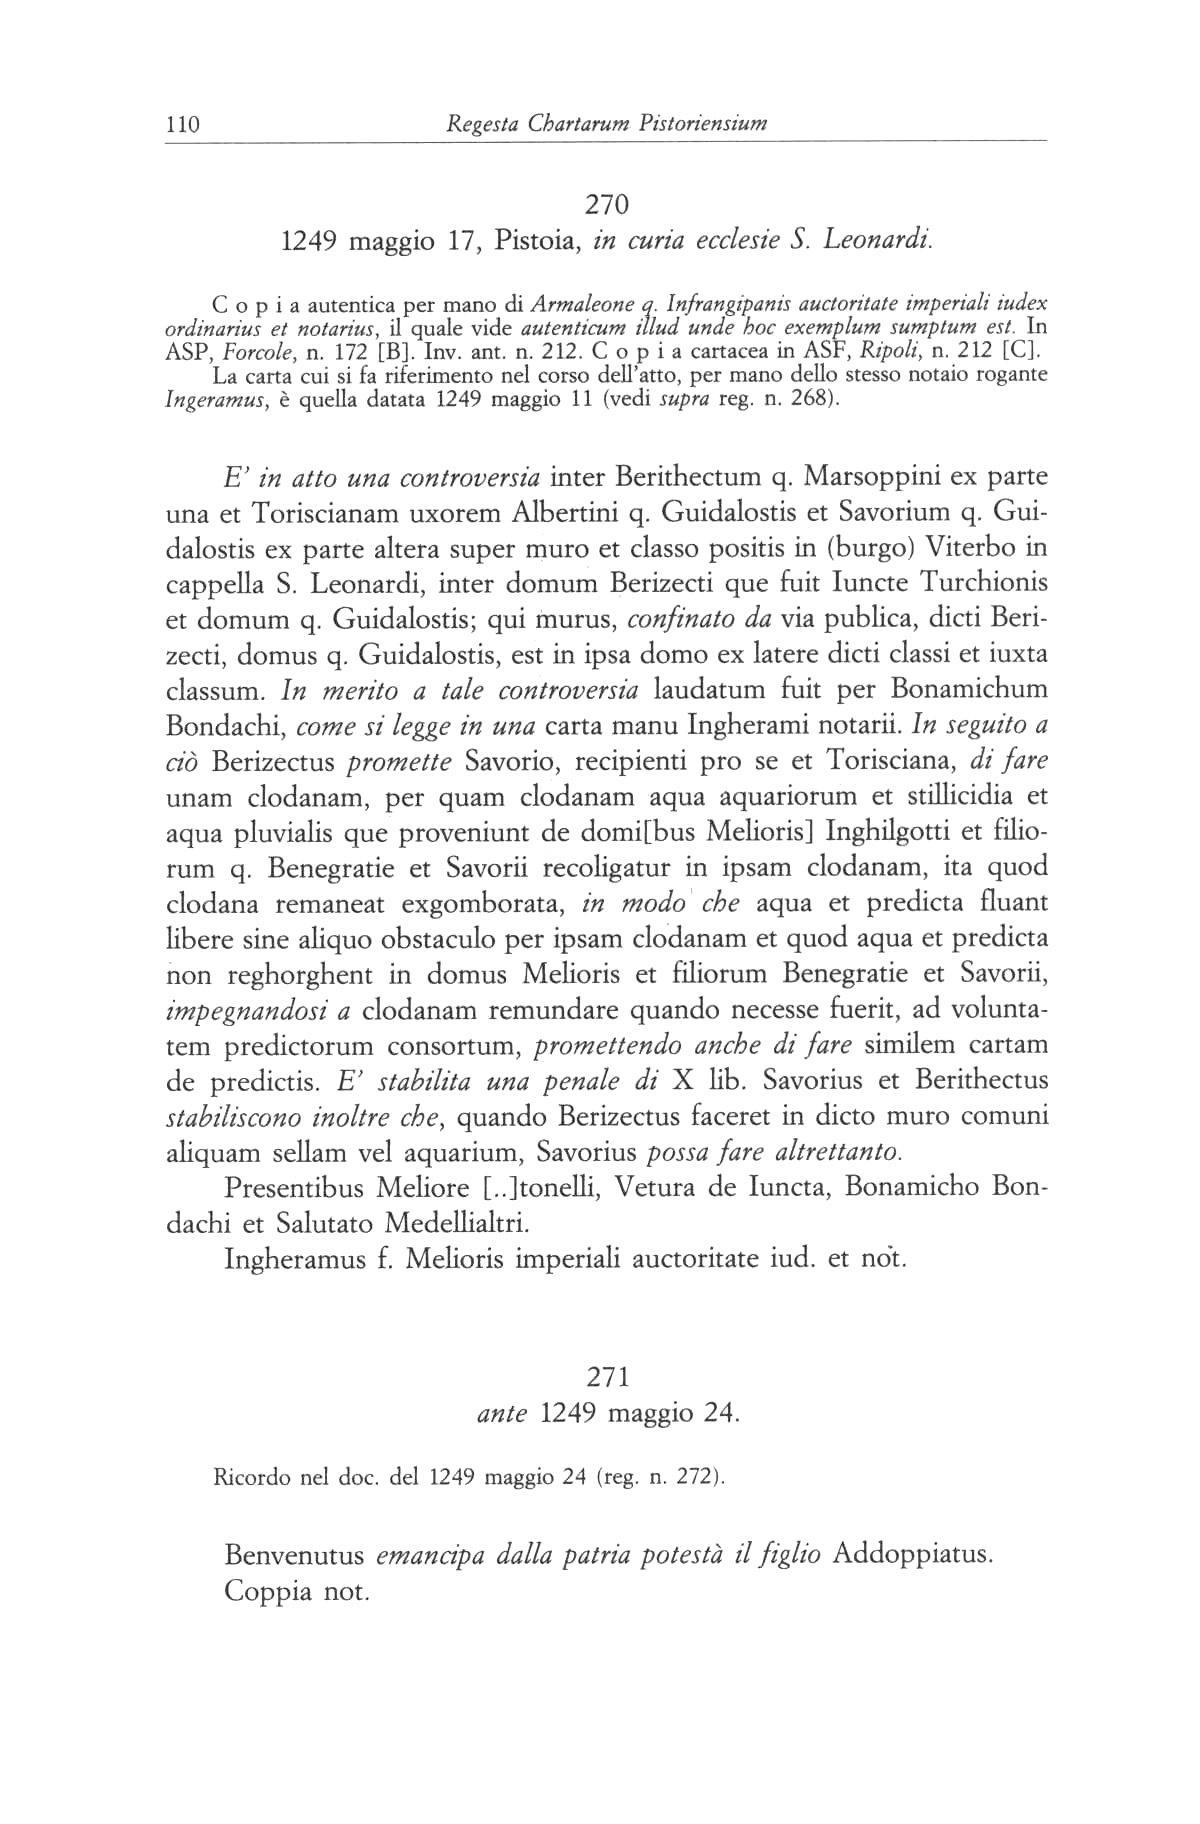 Monastero Forcole 0110.jpg